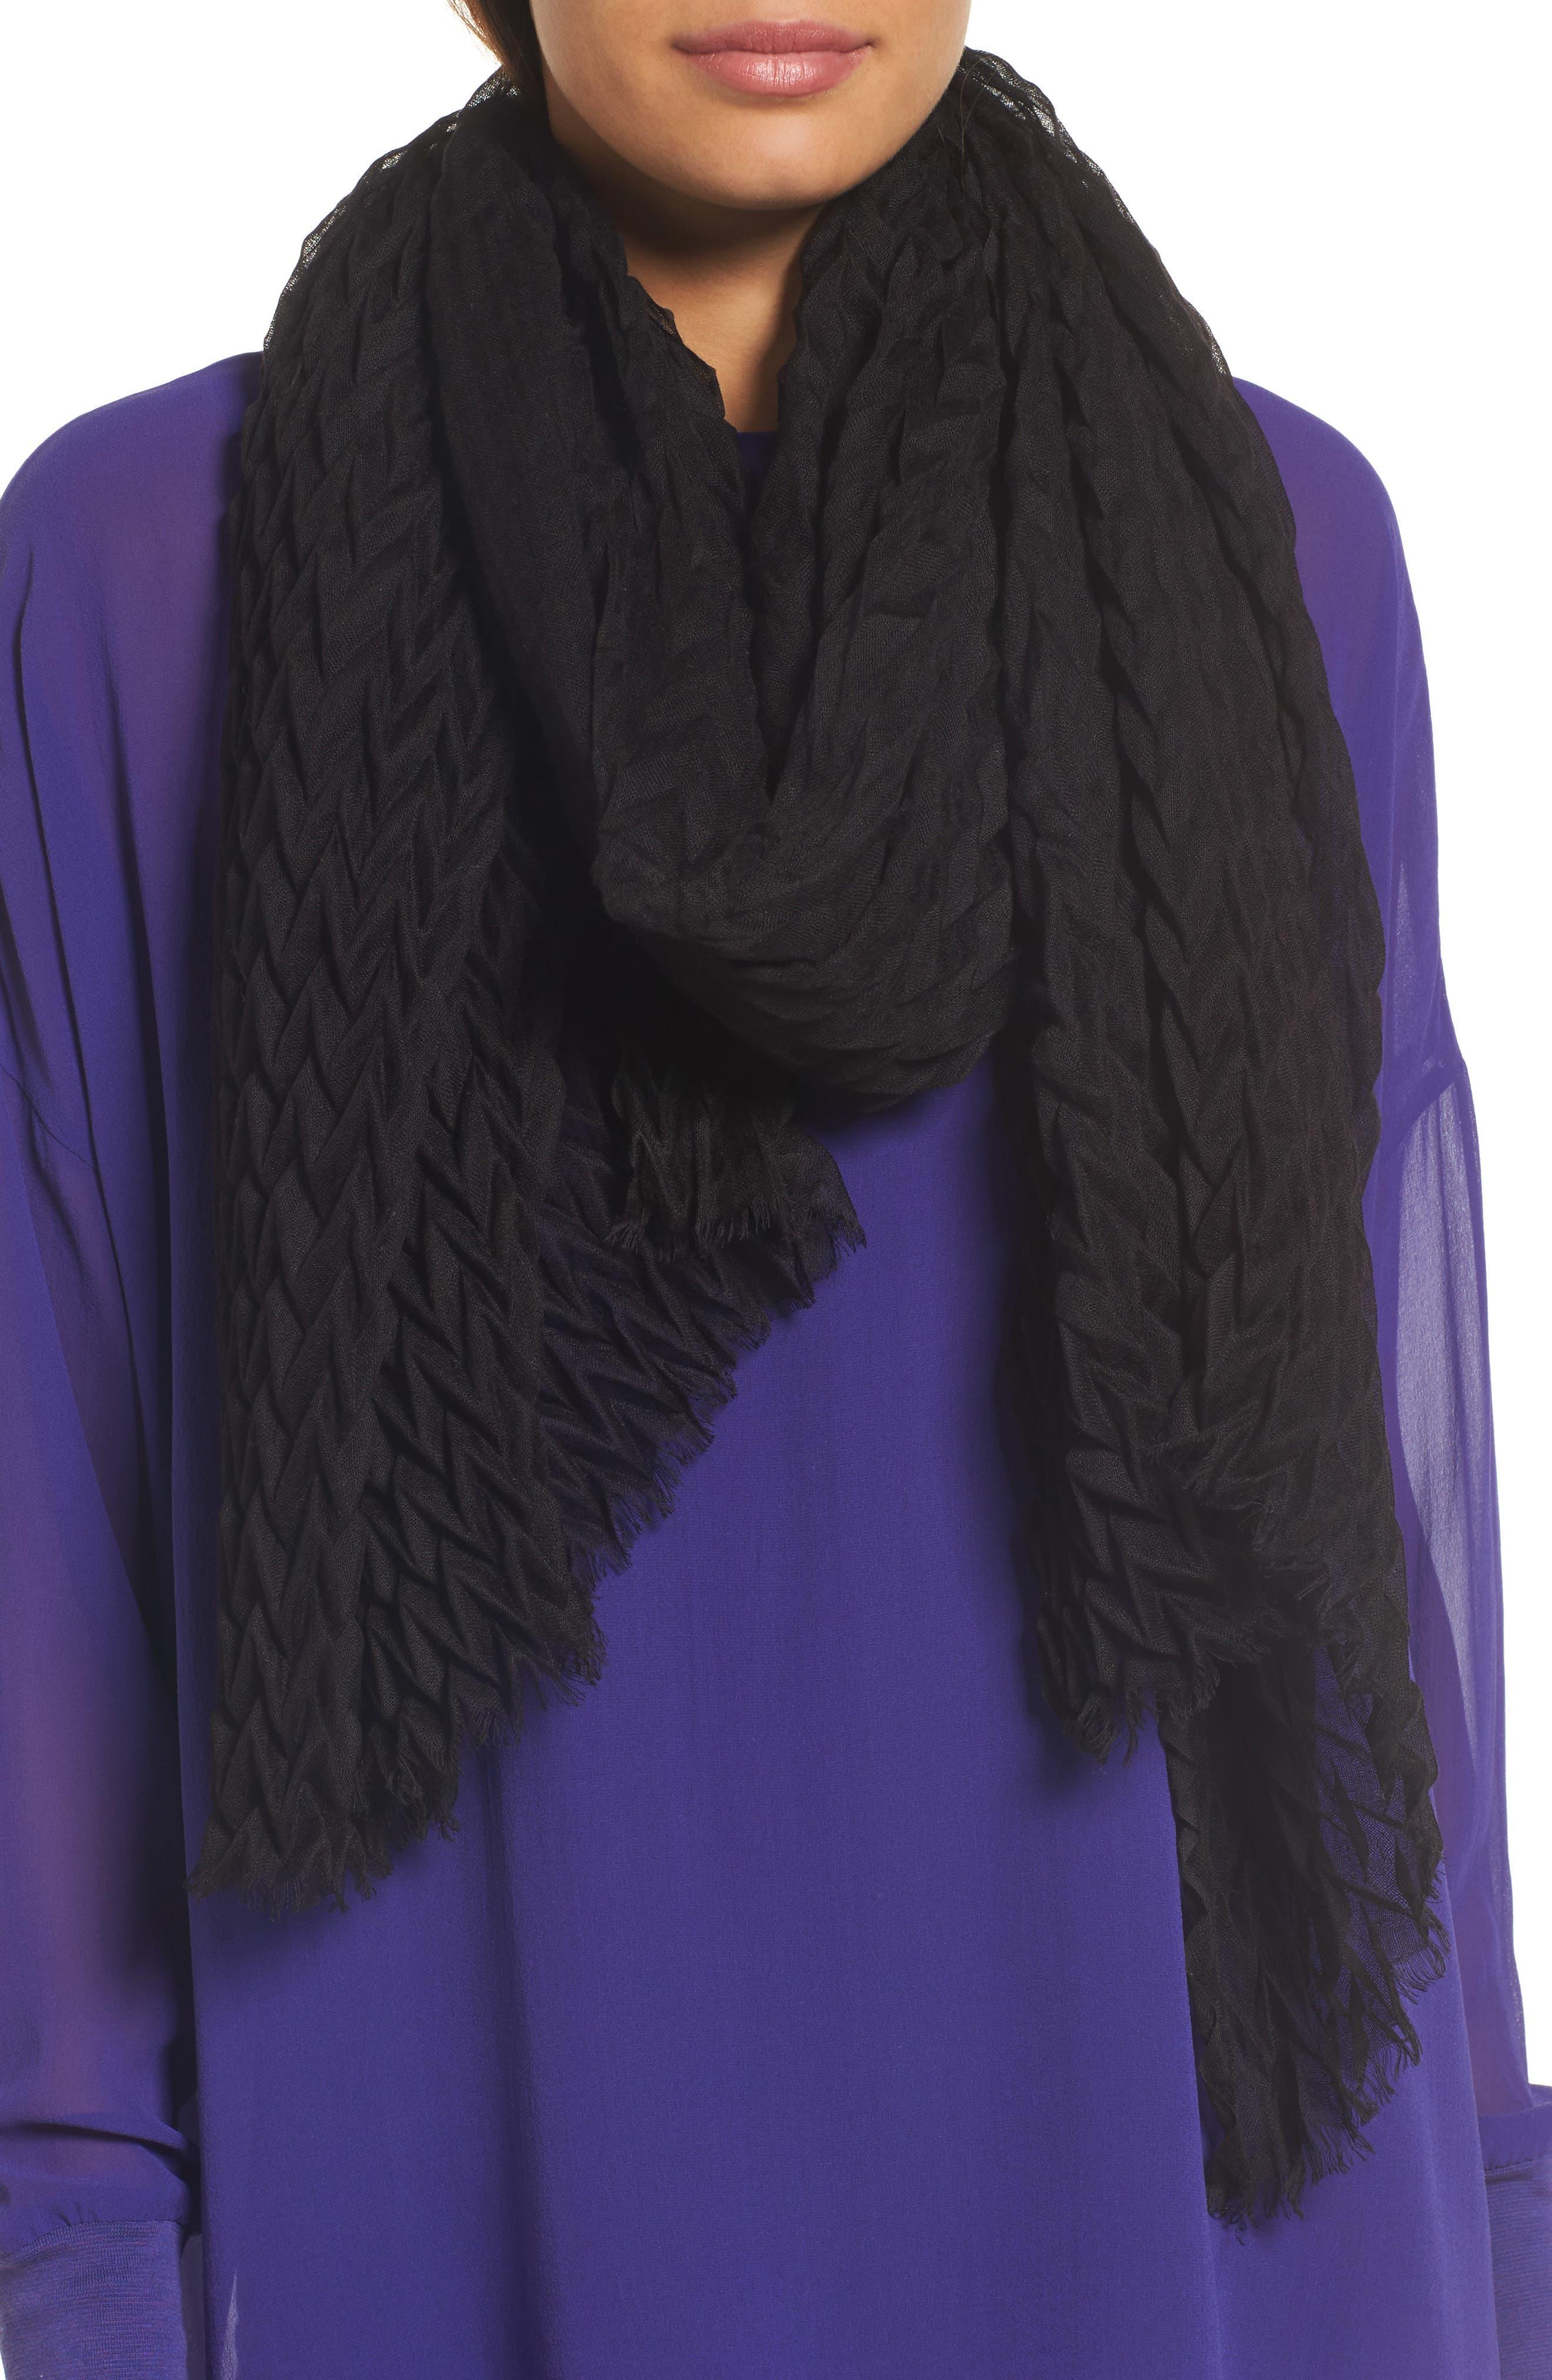 Silk & Wool Wrap,                         Main,                         color, Black